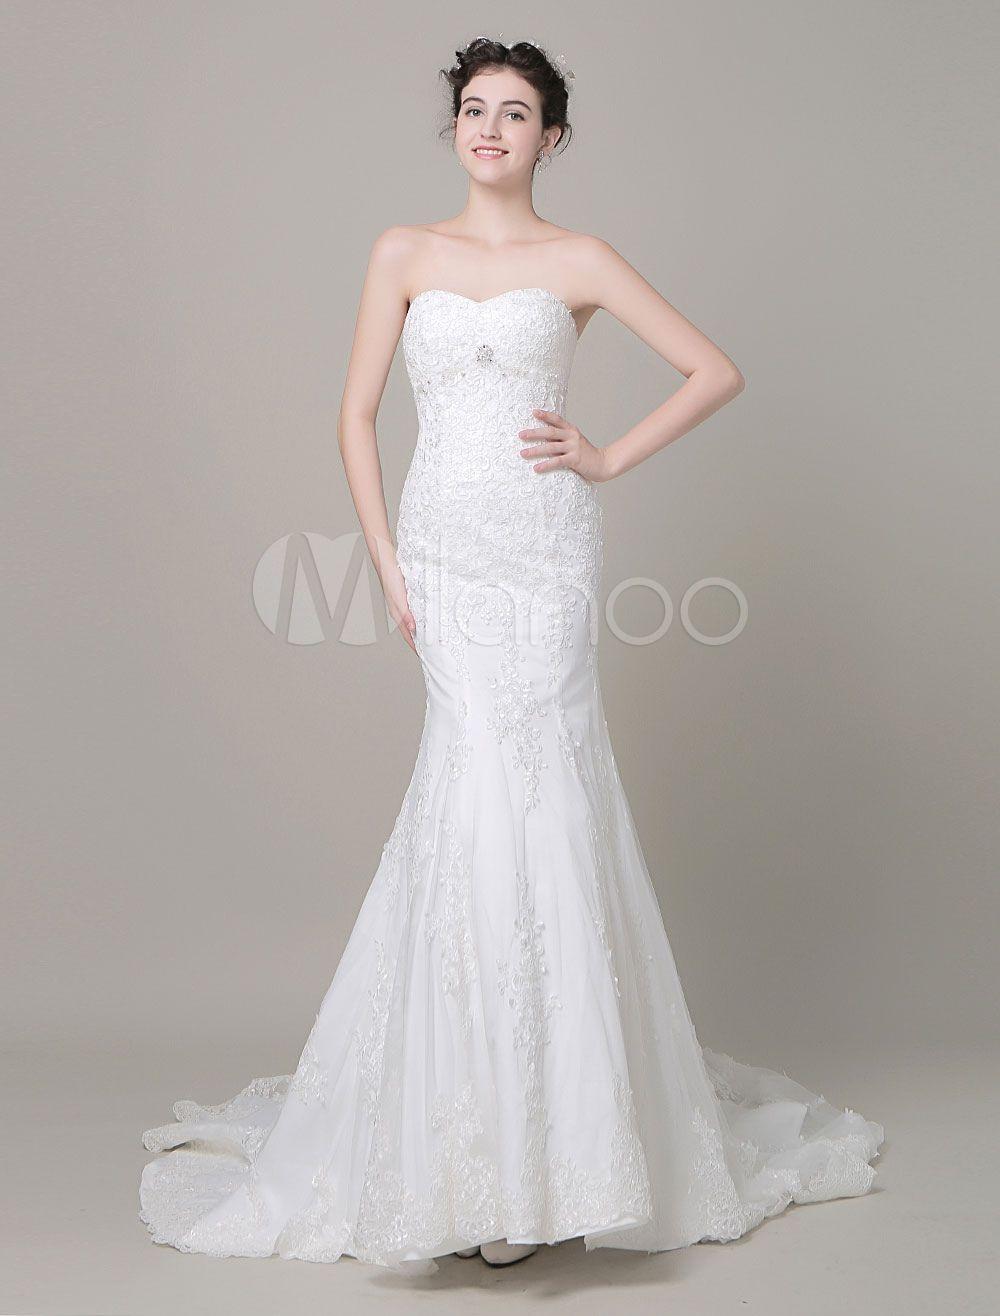 fashionclothing weddingapparel costume womens mens and